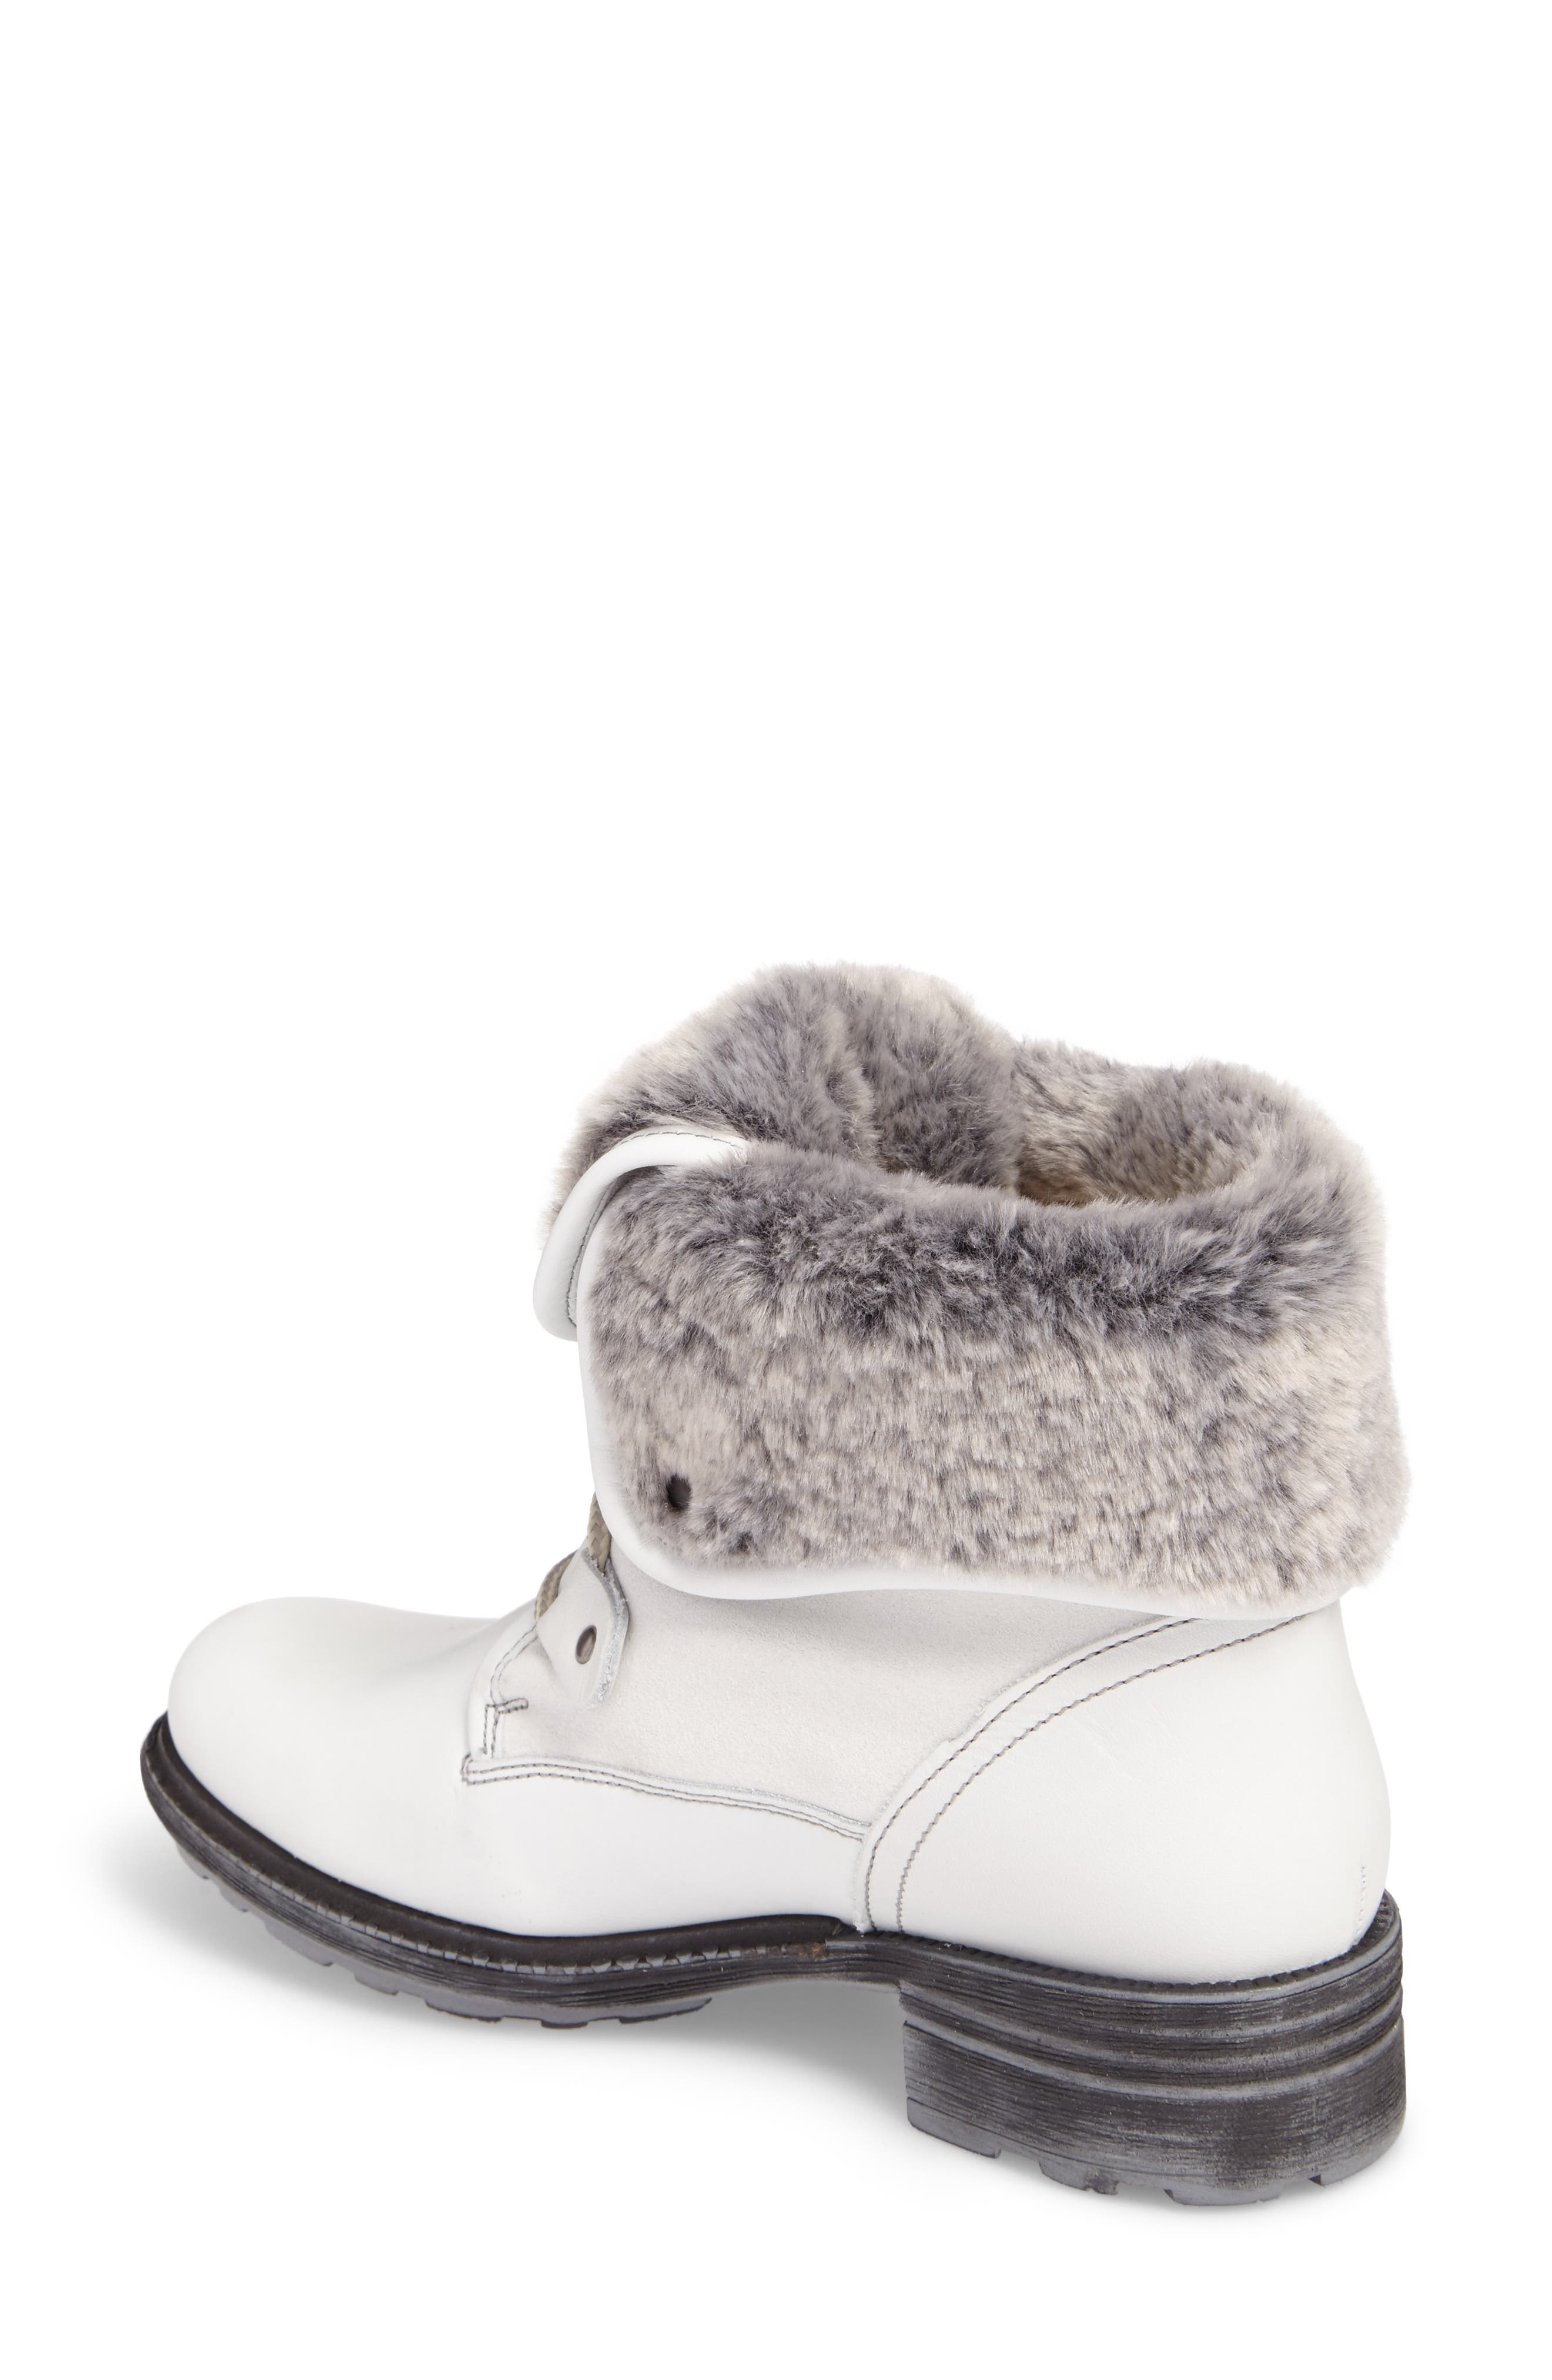 Springfield Waterproof Winter Boot,                             Alternate thumbnail 2, color,                             White/ Grey/ Black